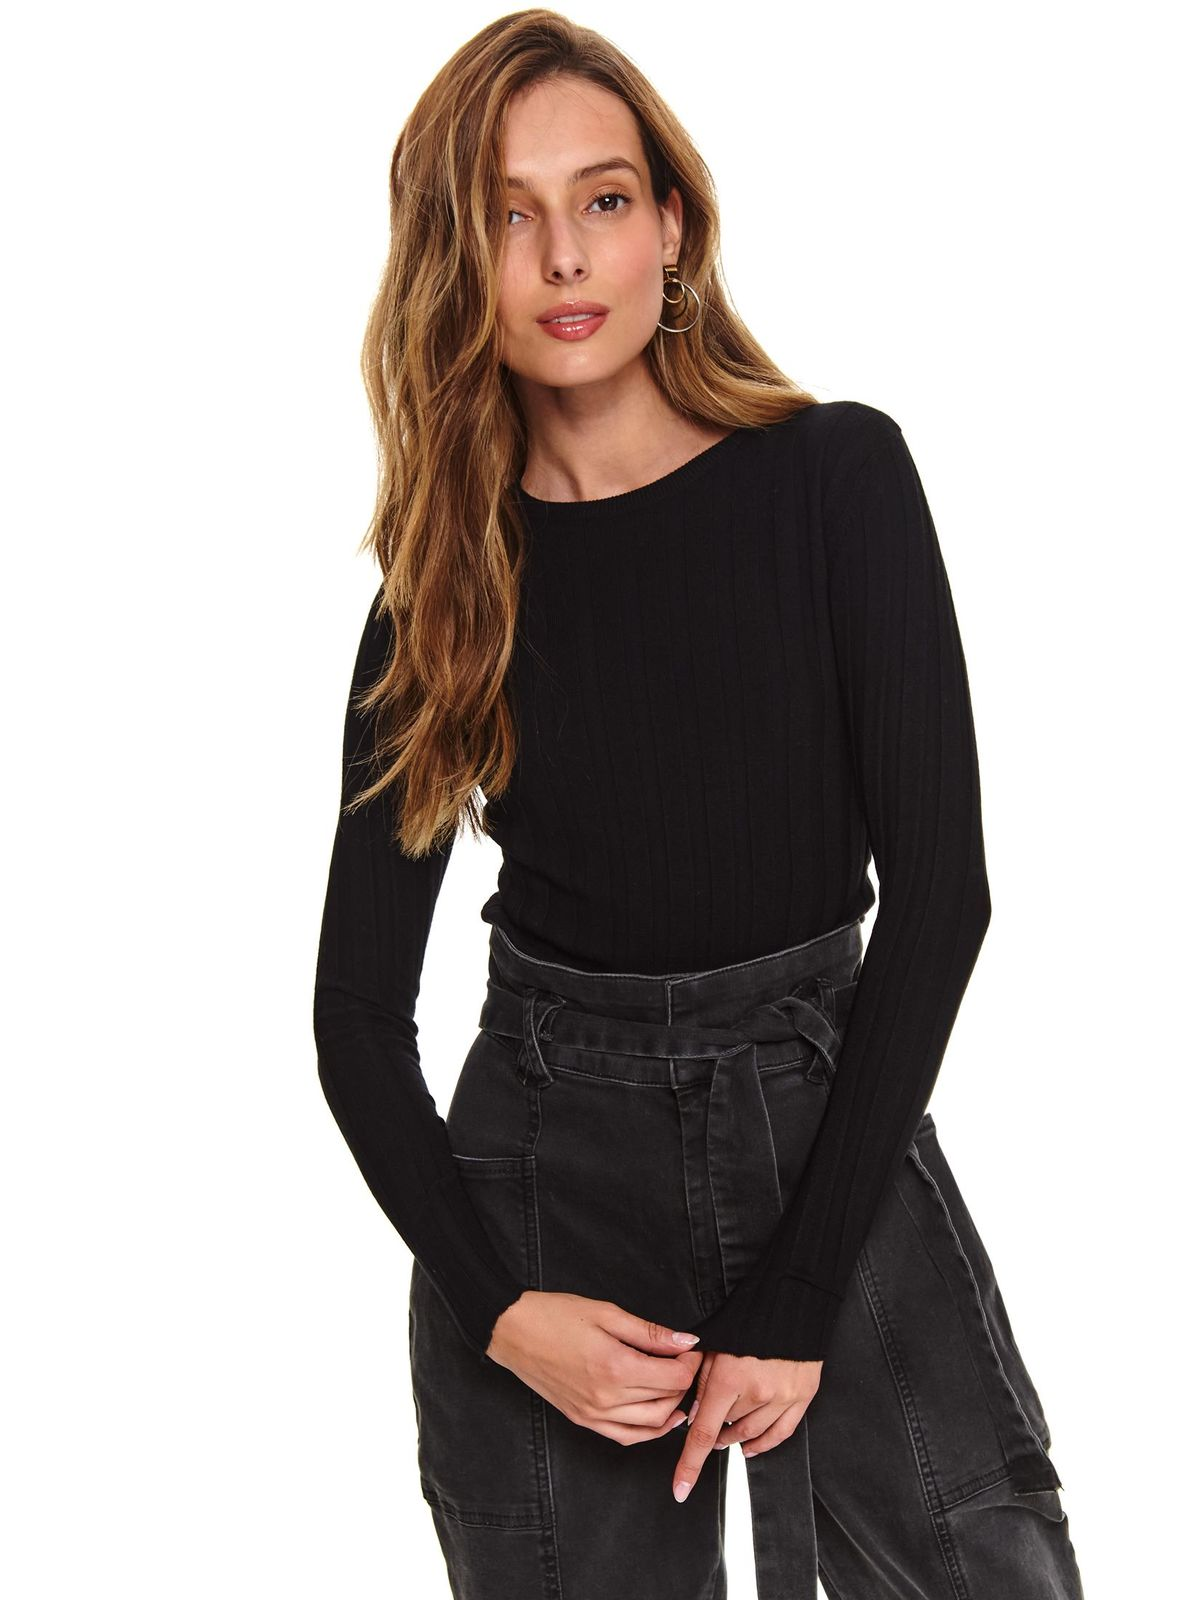 Top Secret S052206 Black Sweater